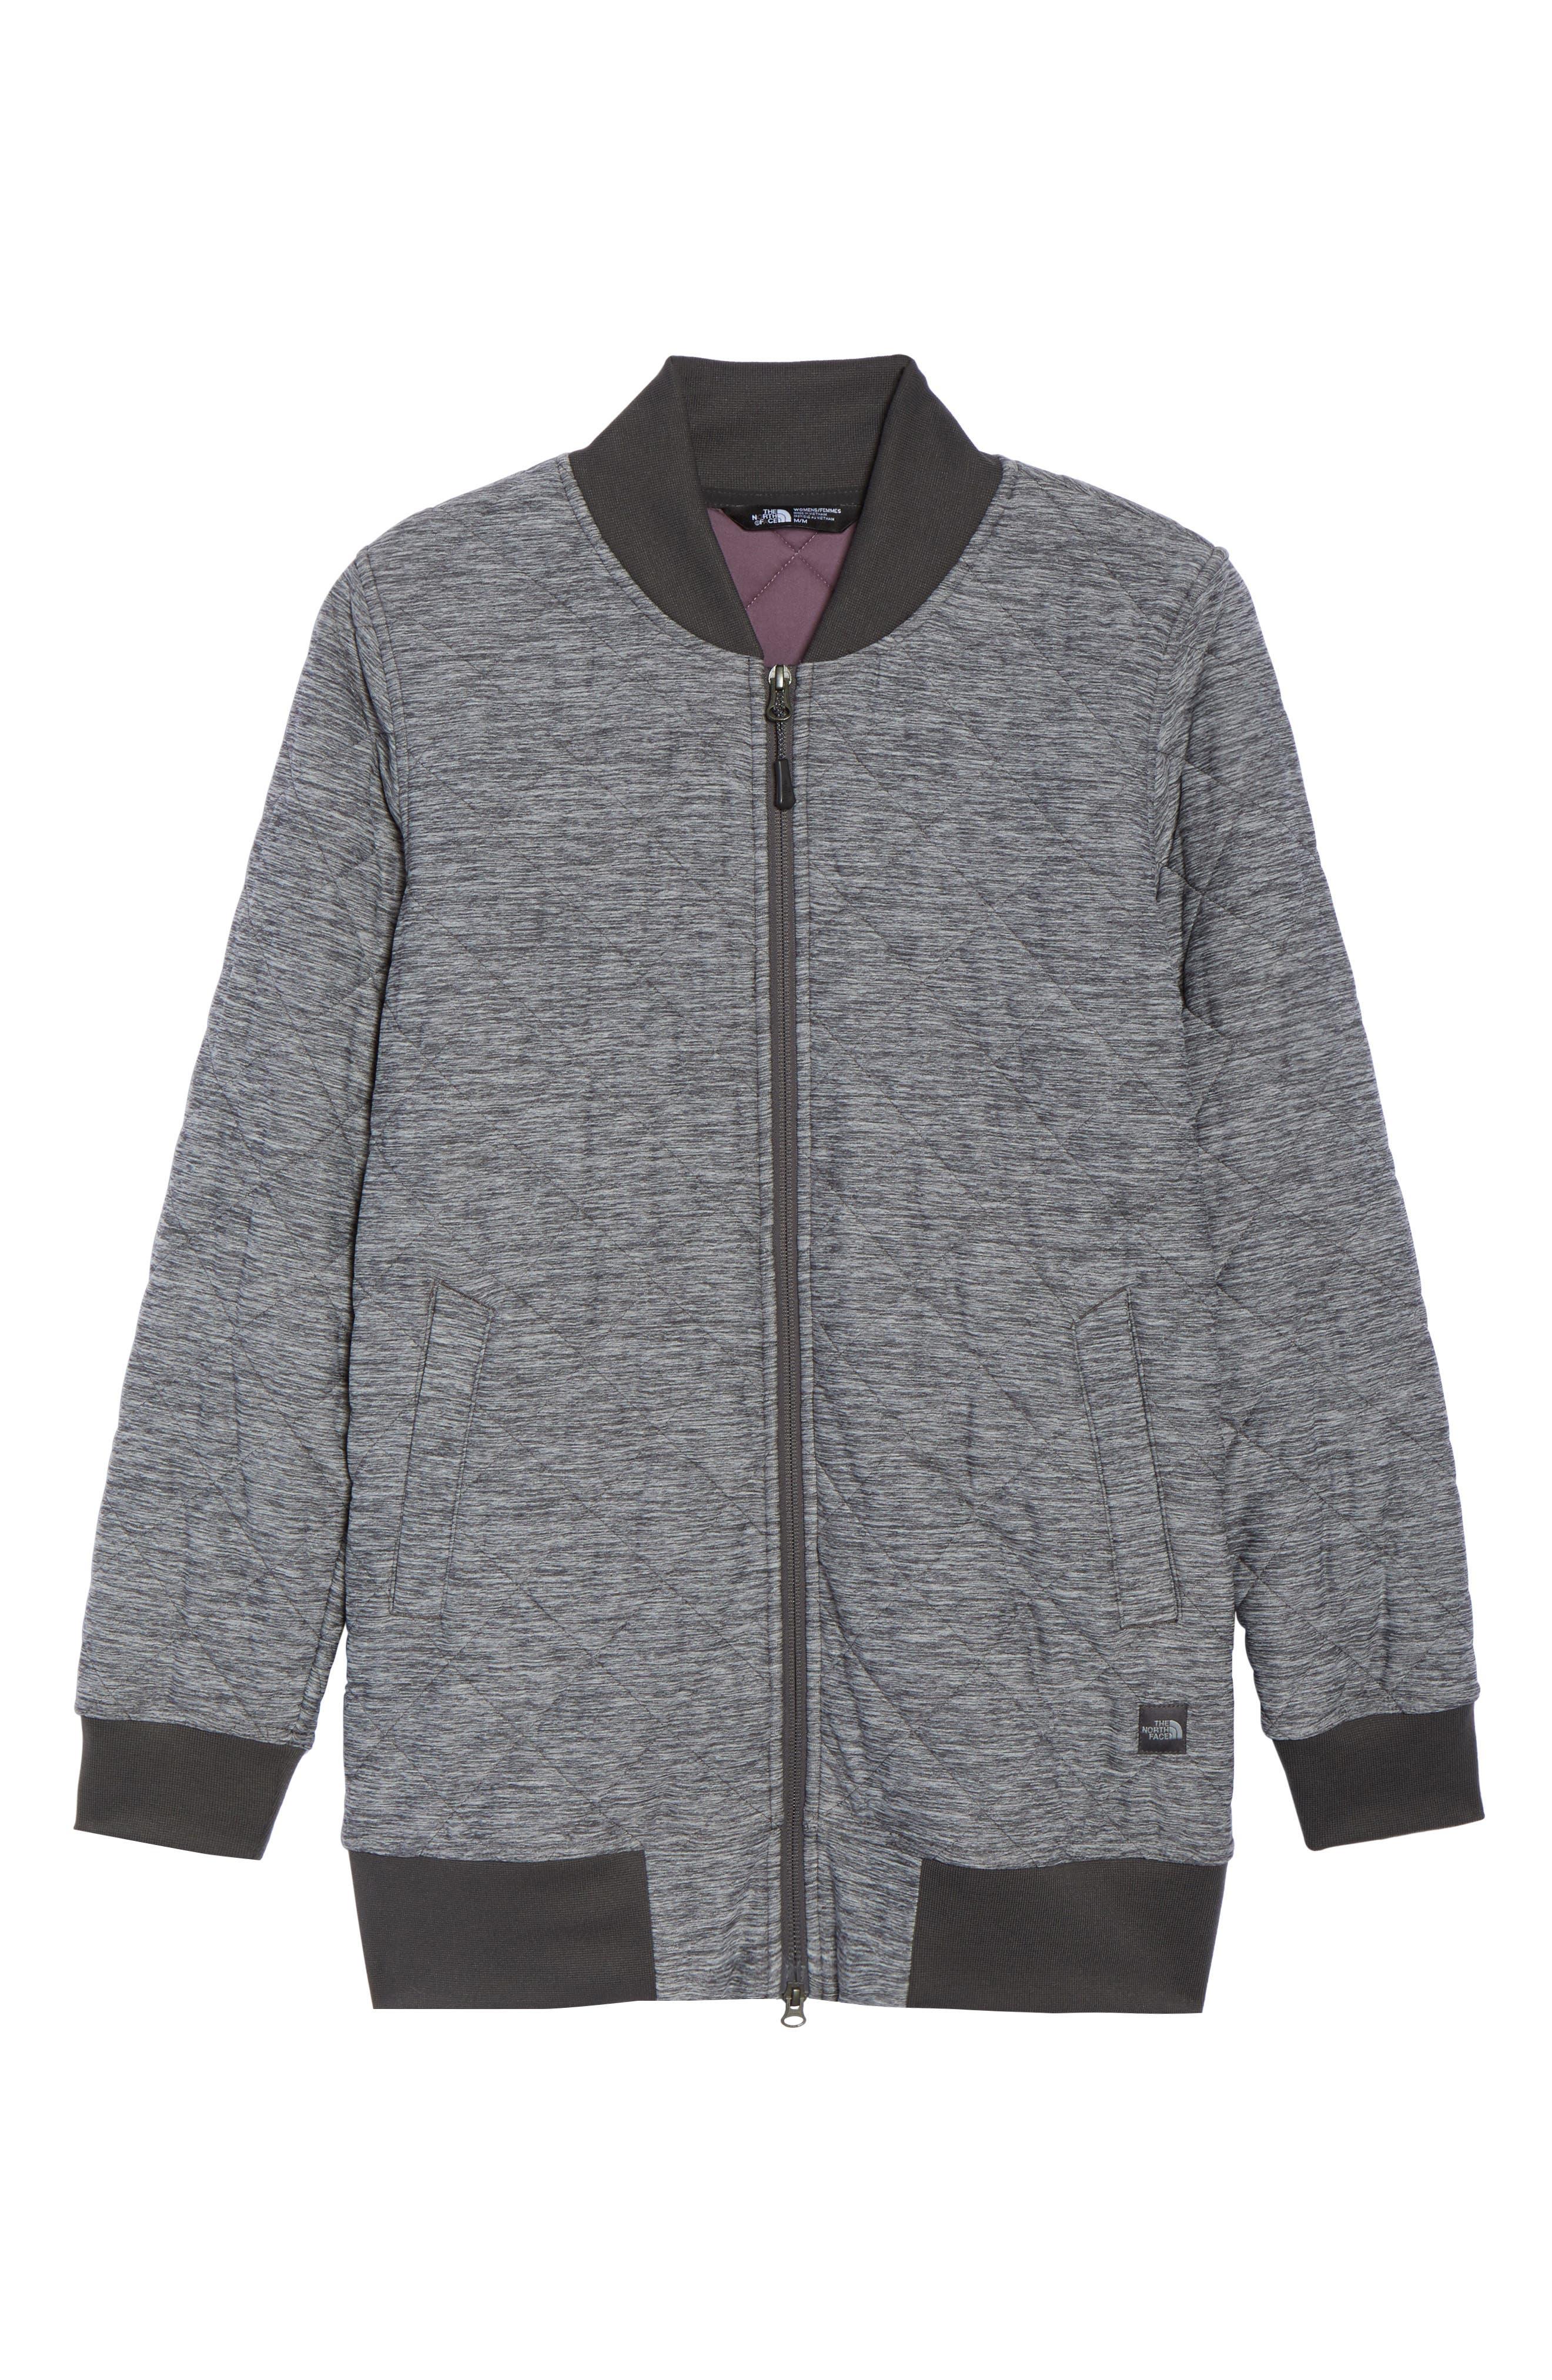 Mod Insulated Knit Jacket,                             Alternate thumbnail 8, color,                             Tnf Dark Grey Heather